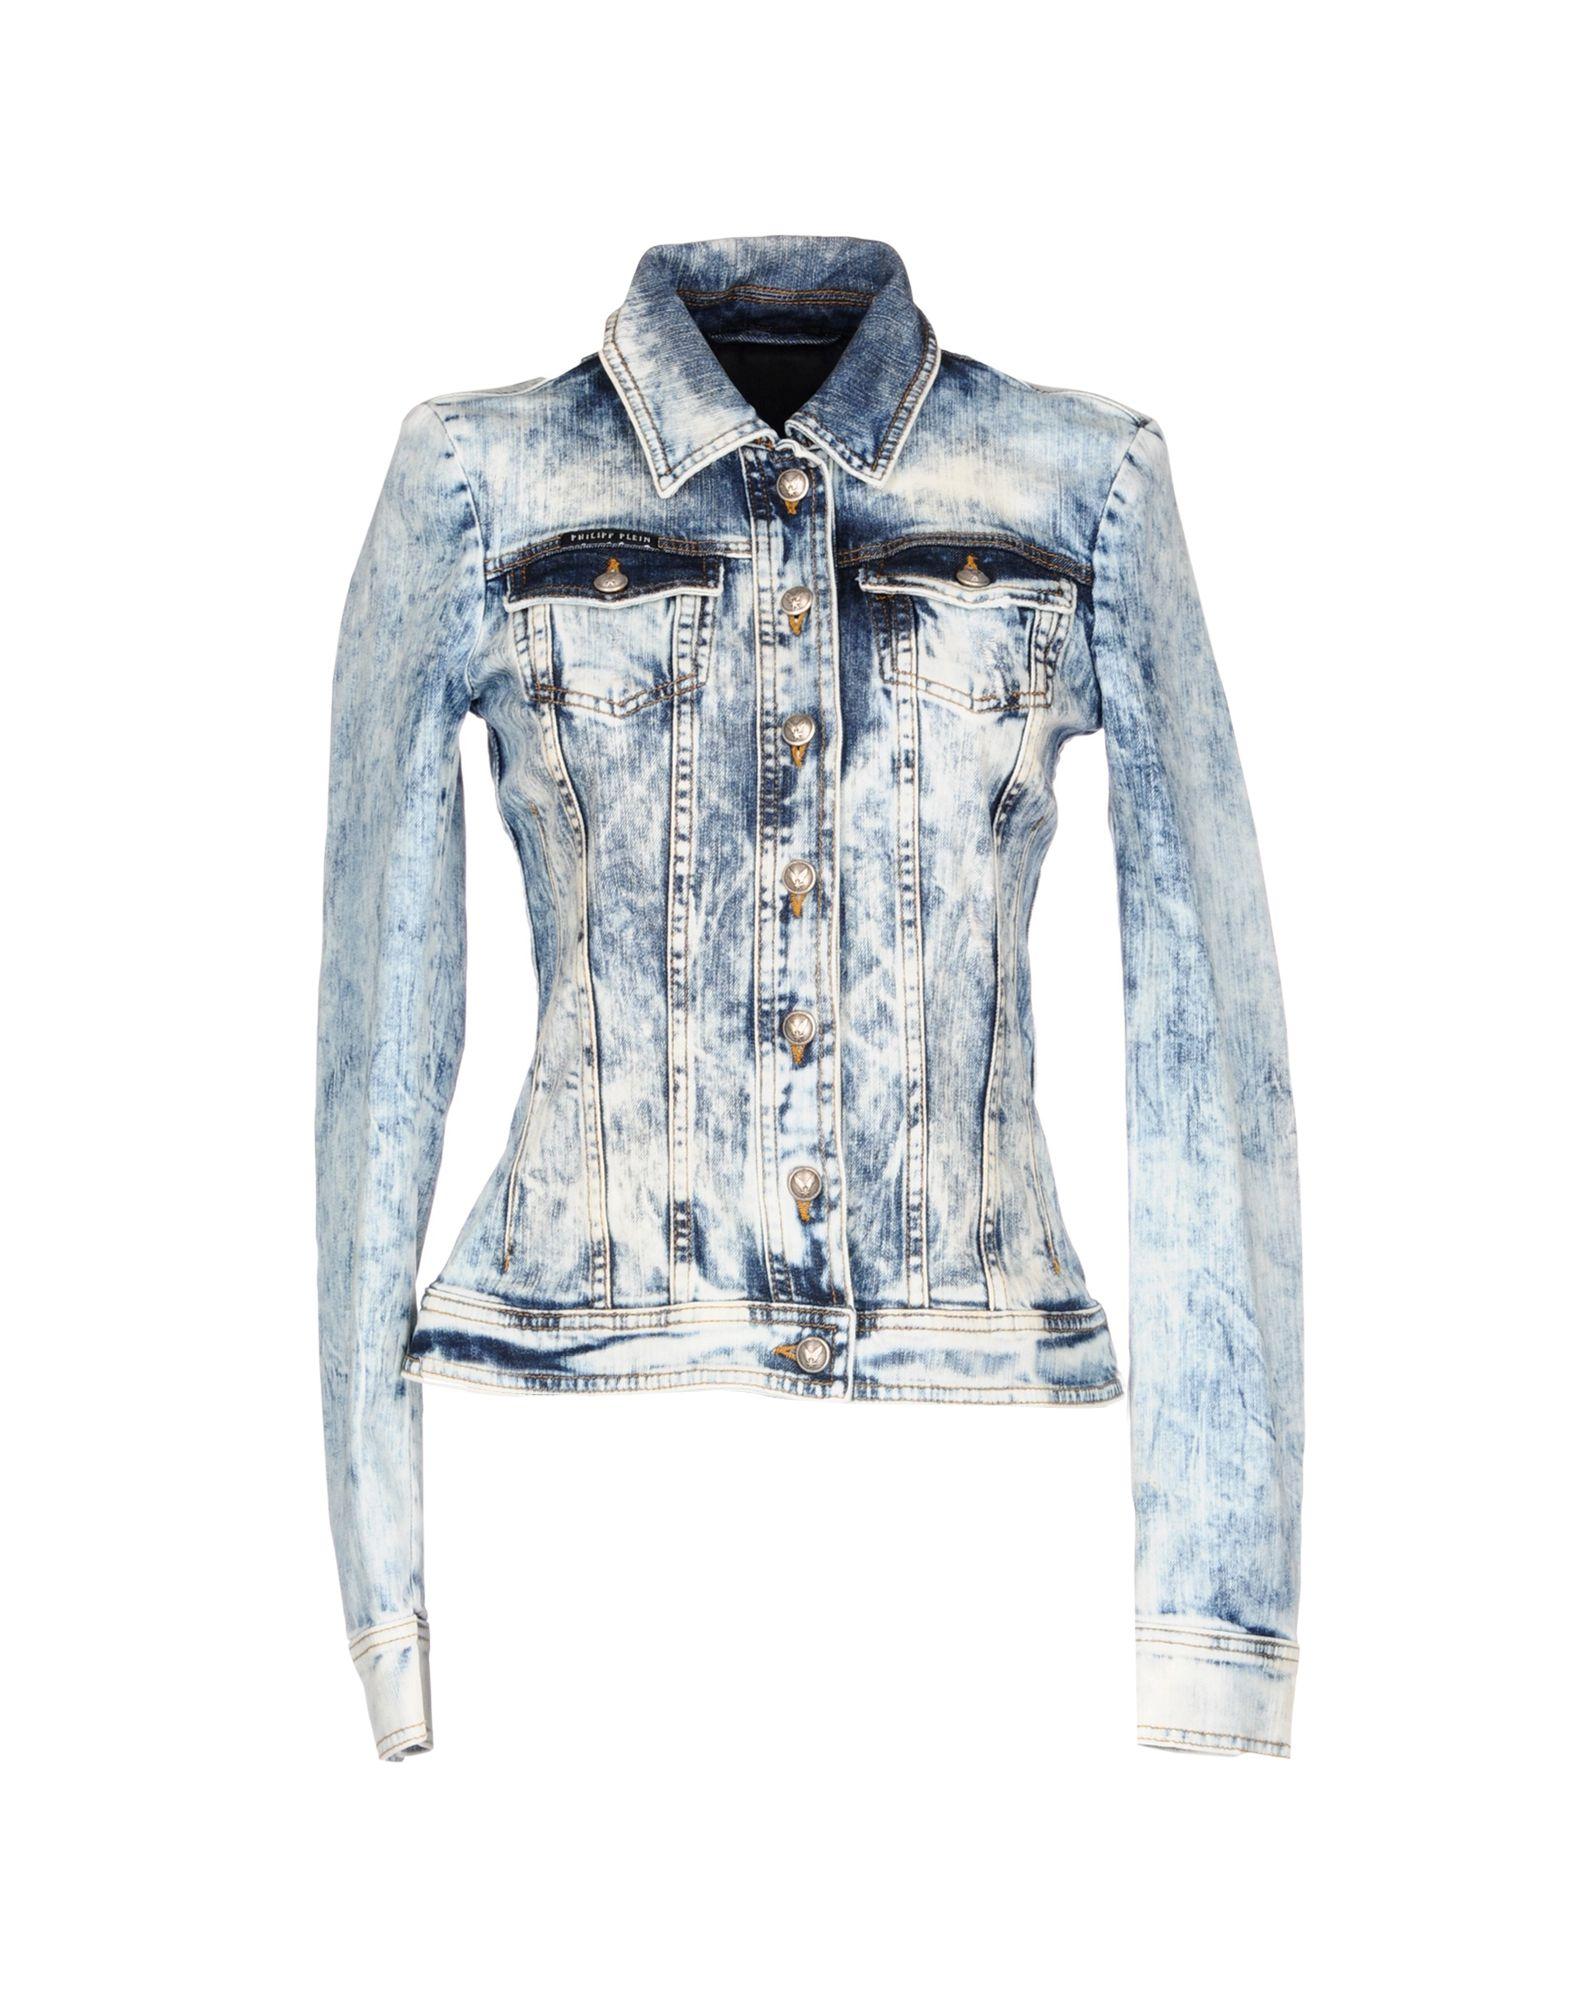 PHILIPP PLEIN Джинсовая верхняя одежда philipp plein джинсовая верхняя одежда